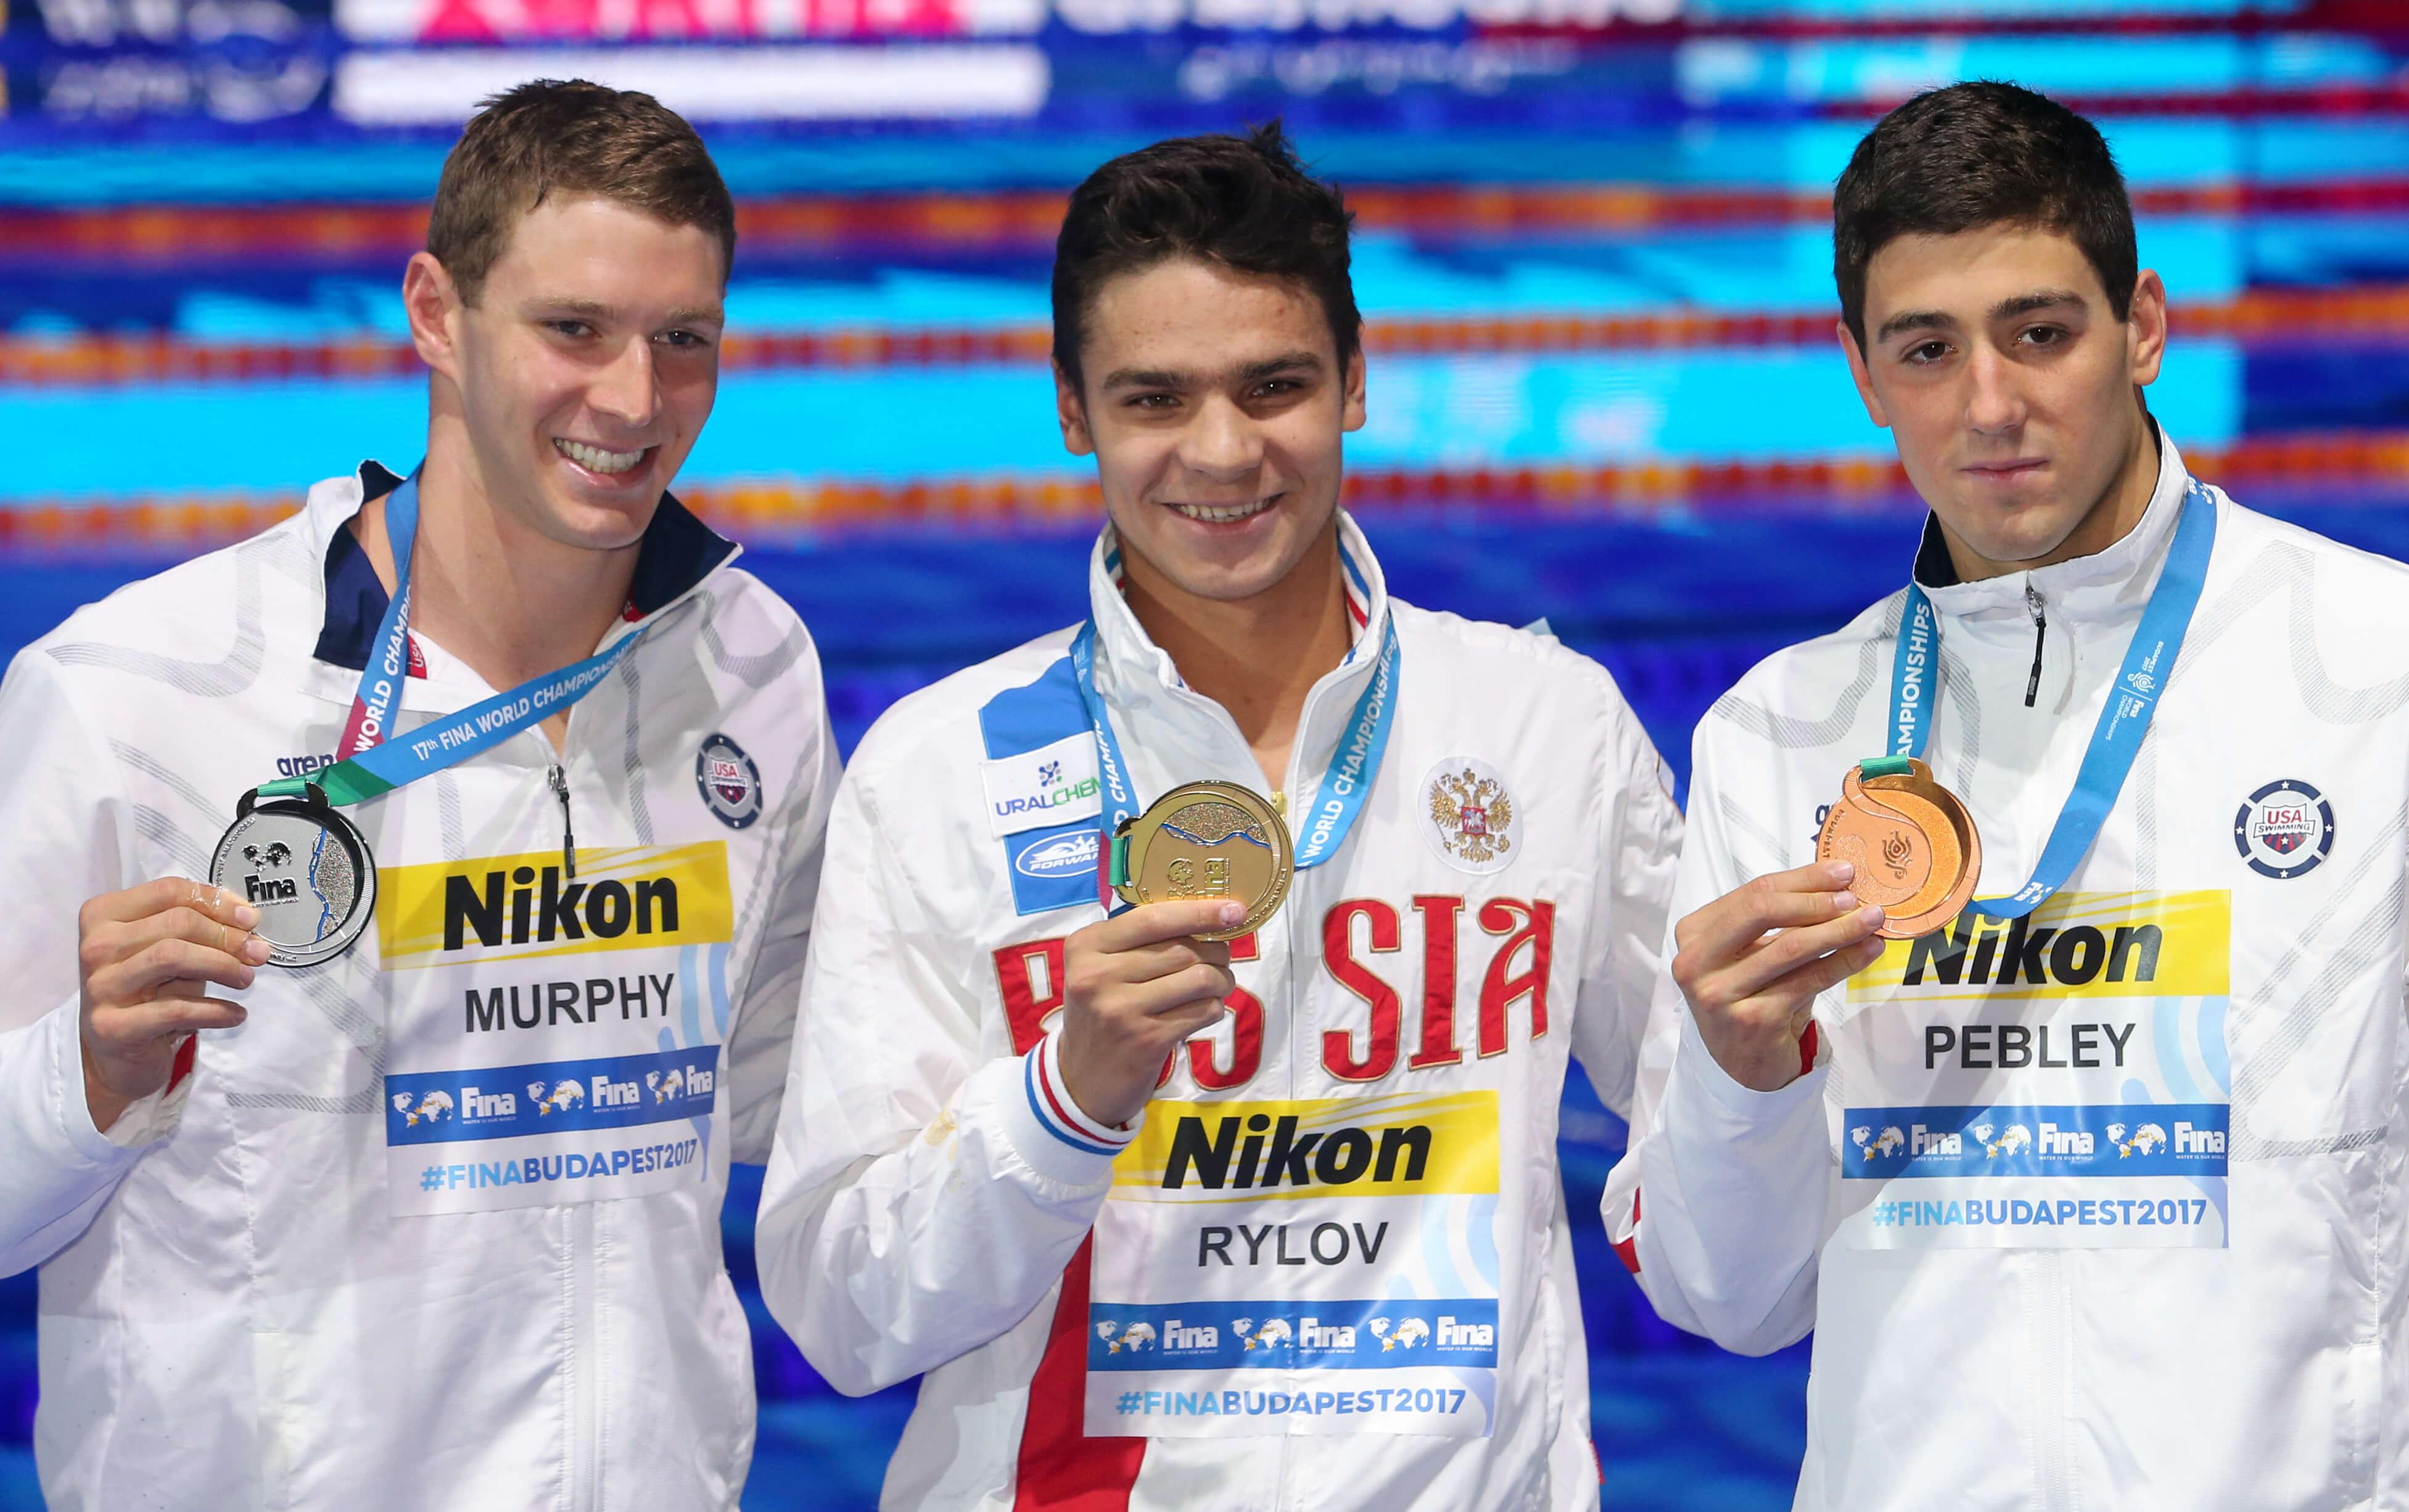 ryan-murphy-usa-evgeny-rylov-rus-jacob-pebley-usa-medals-2017-world-champs